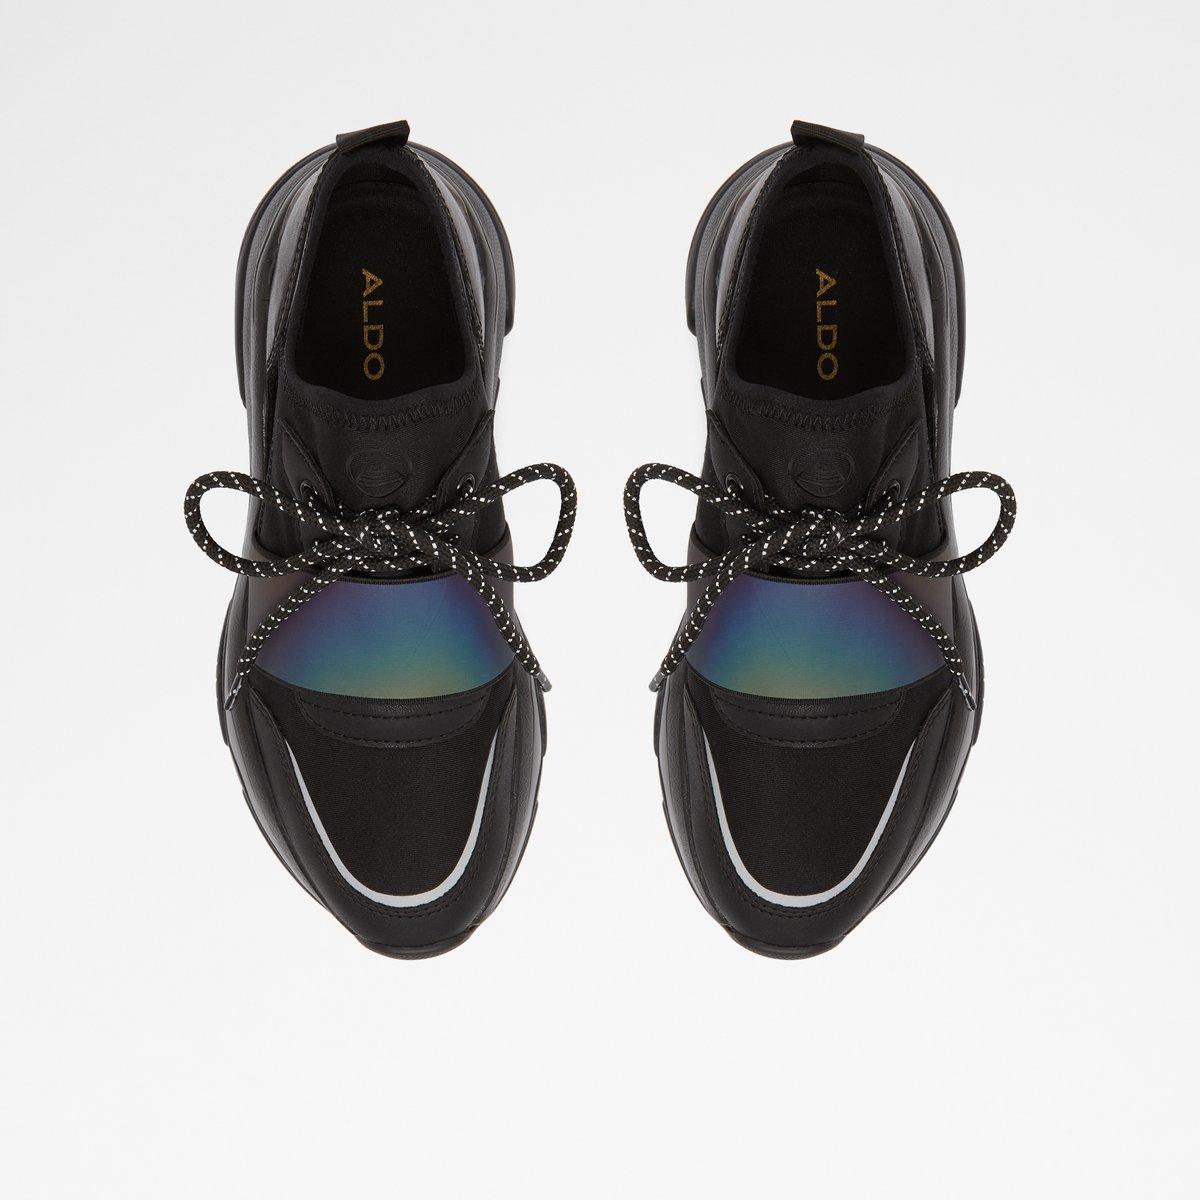 Rev Black Women's Sneakers | ALDO Canada